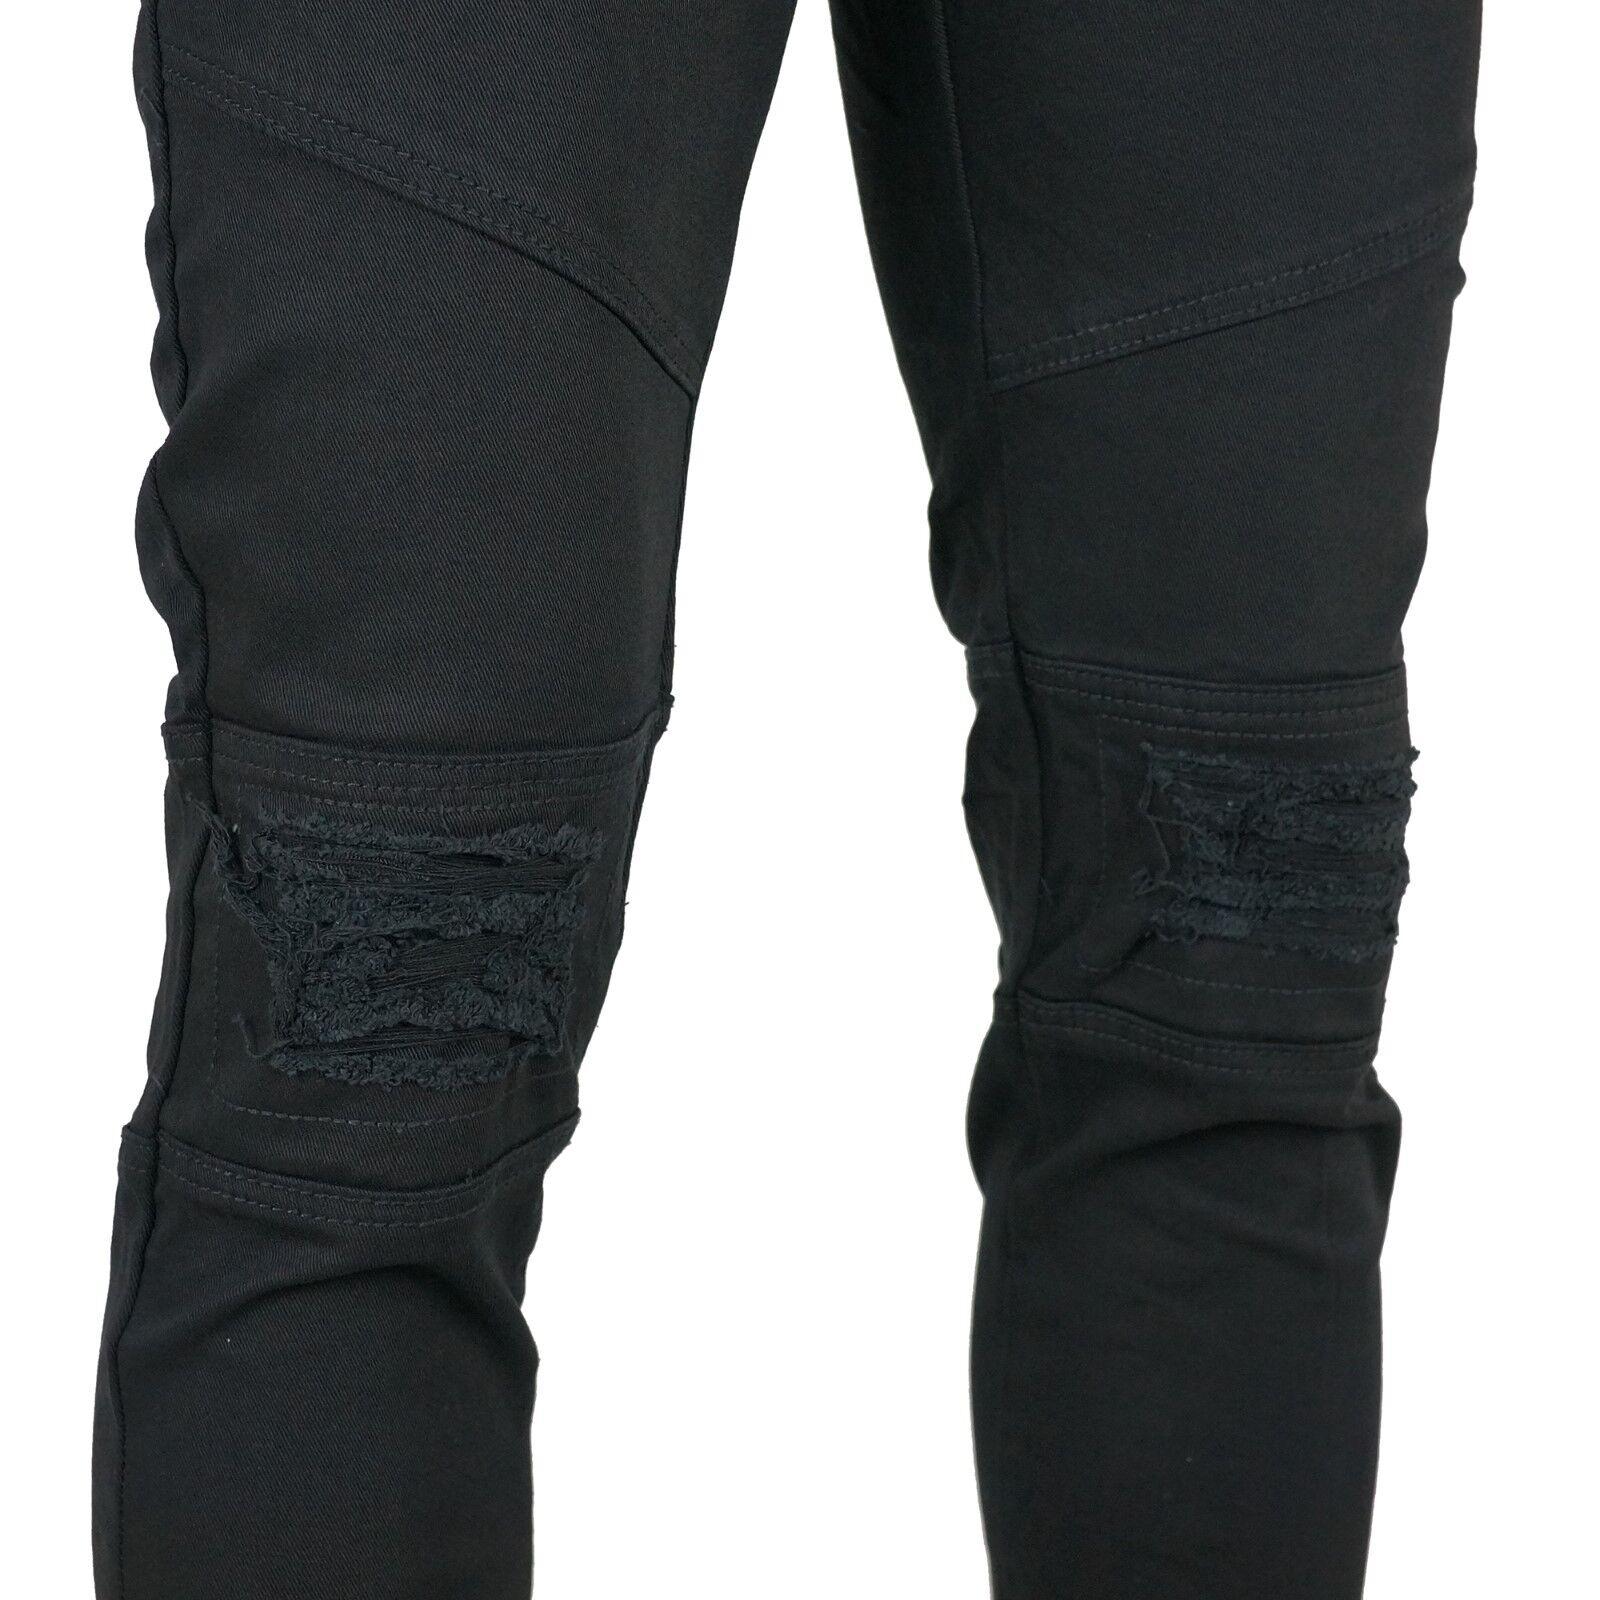 KDNK Men/'s Knee Destroyed Patch Skinny Fit Jeans Pants 30-38